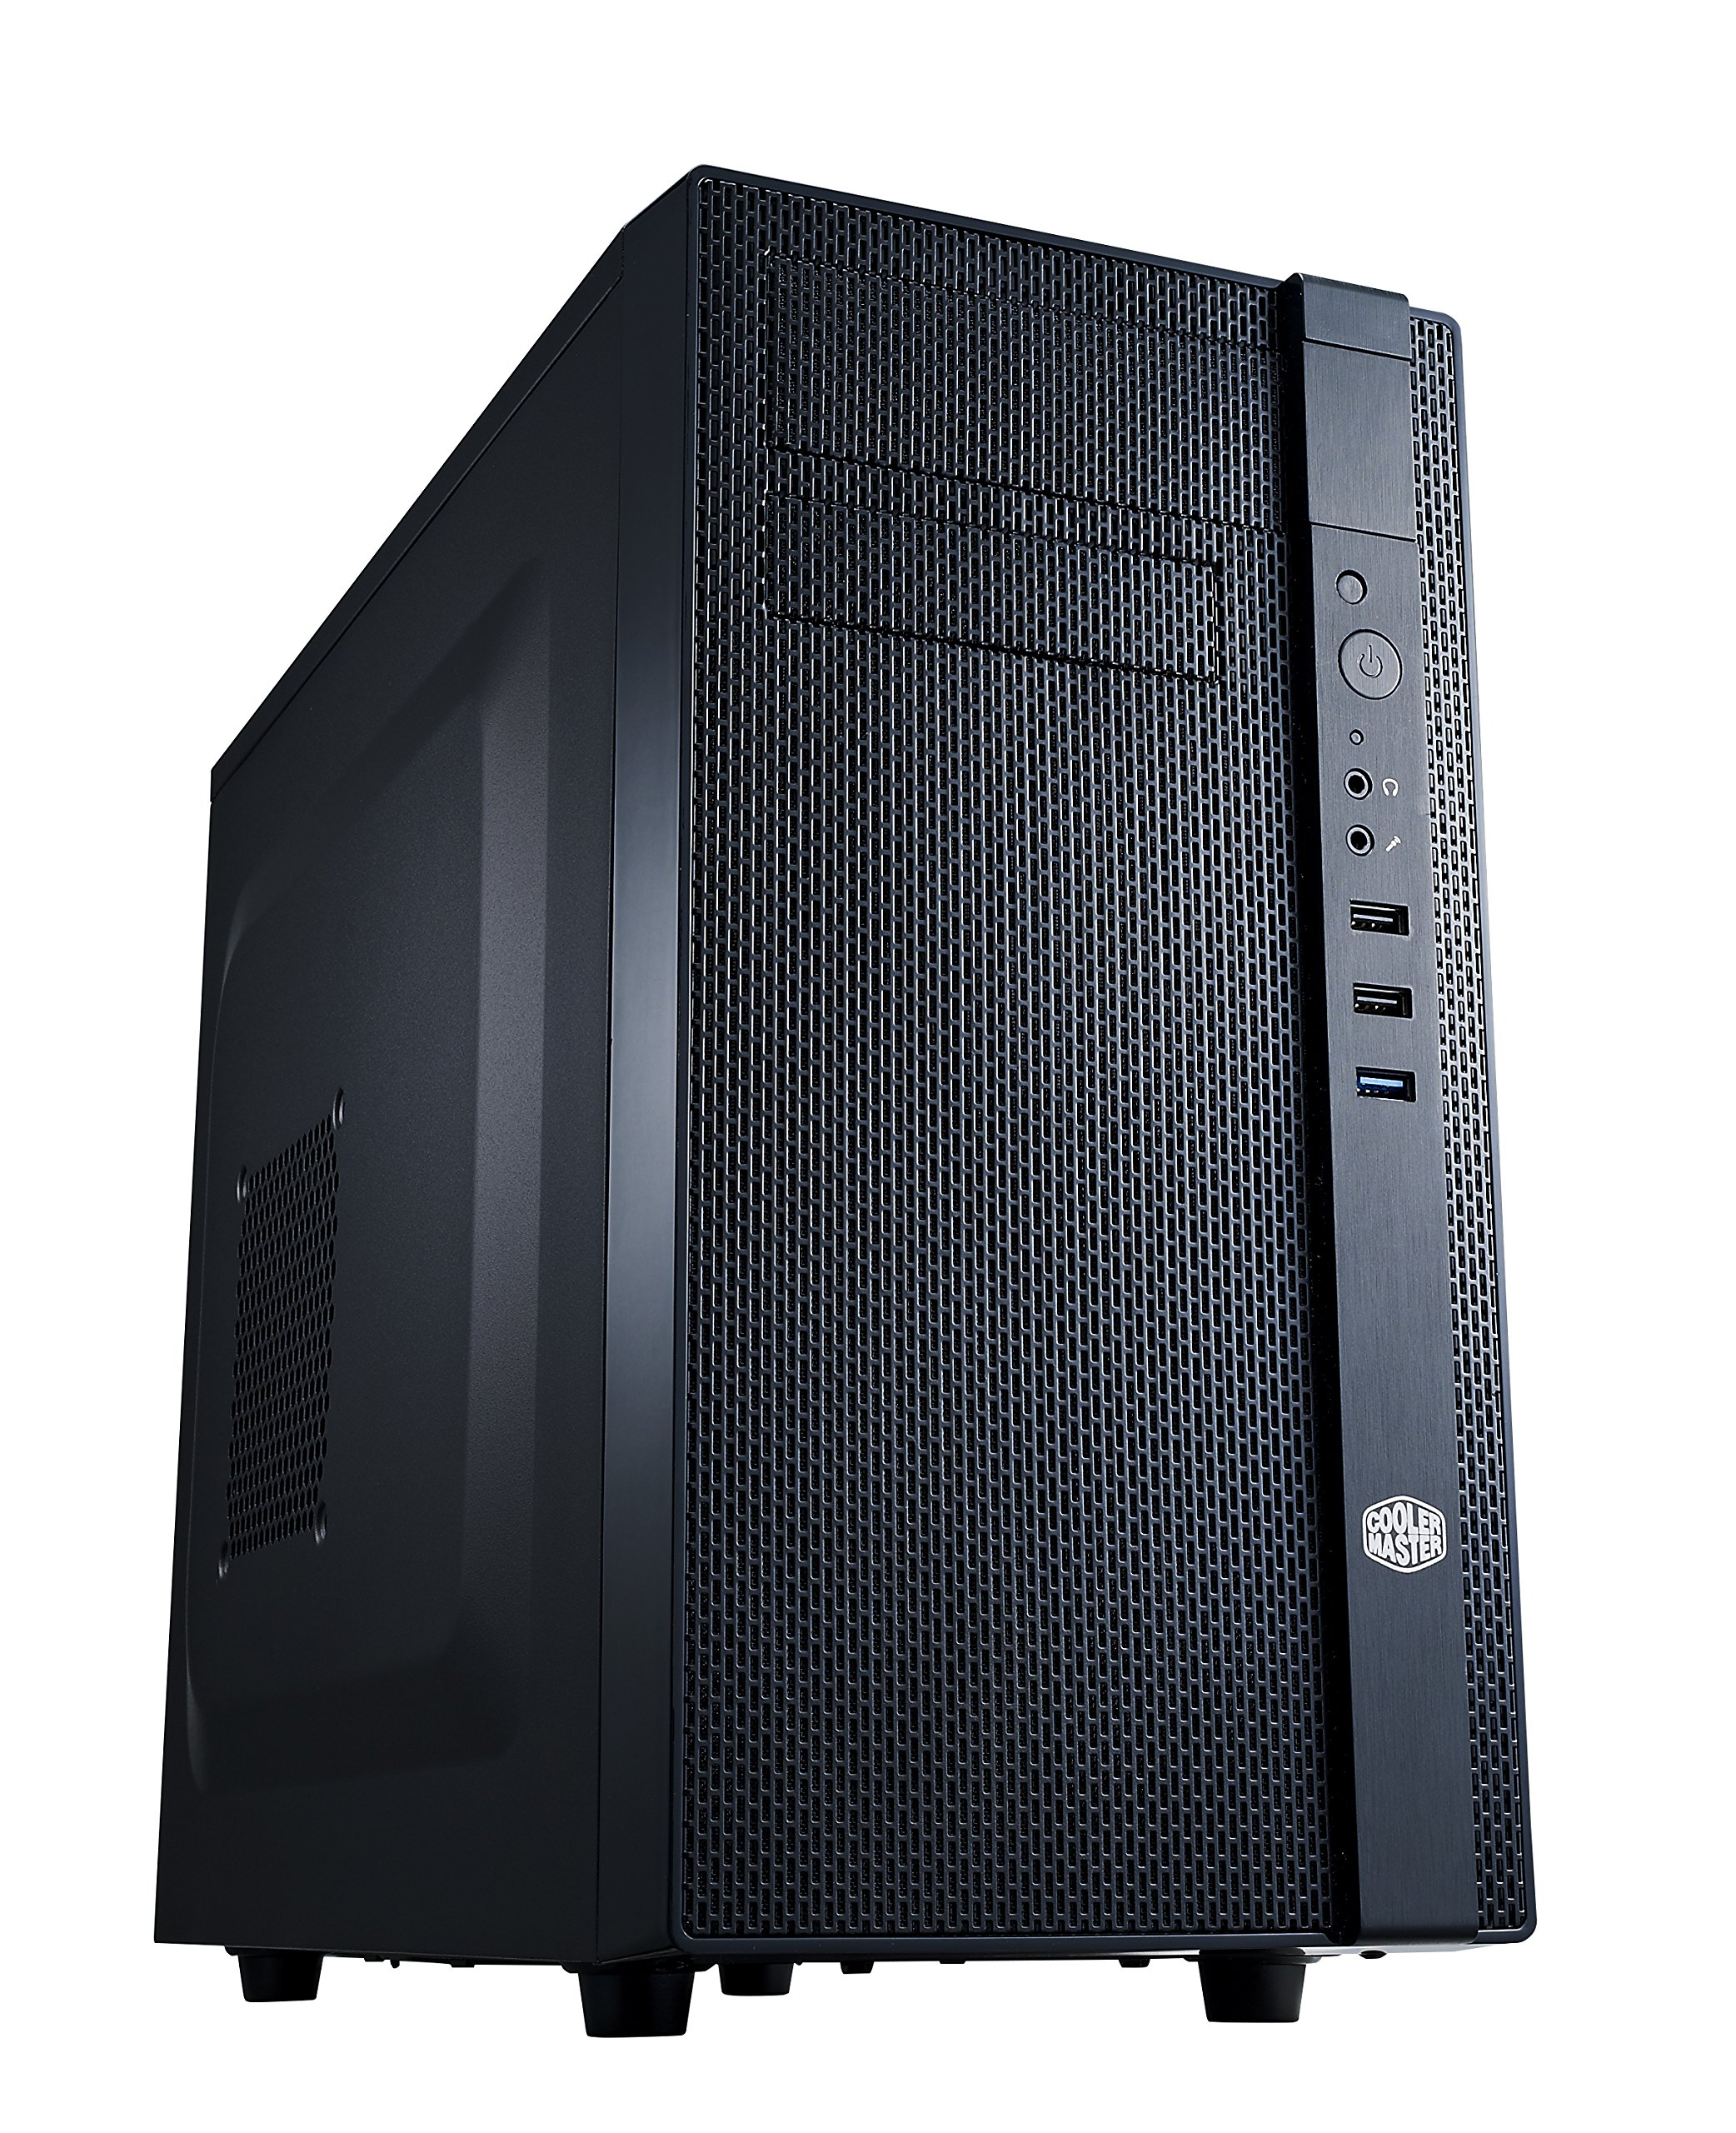 Cooler Master N200 - Caja de Ordenador (Mini-Tower, PC, Micro-ATX, Mini-ITX, 0W, Fondo, 1x 120 mm): Amazon.es: Informática